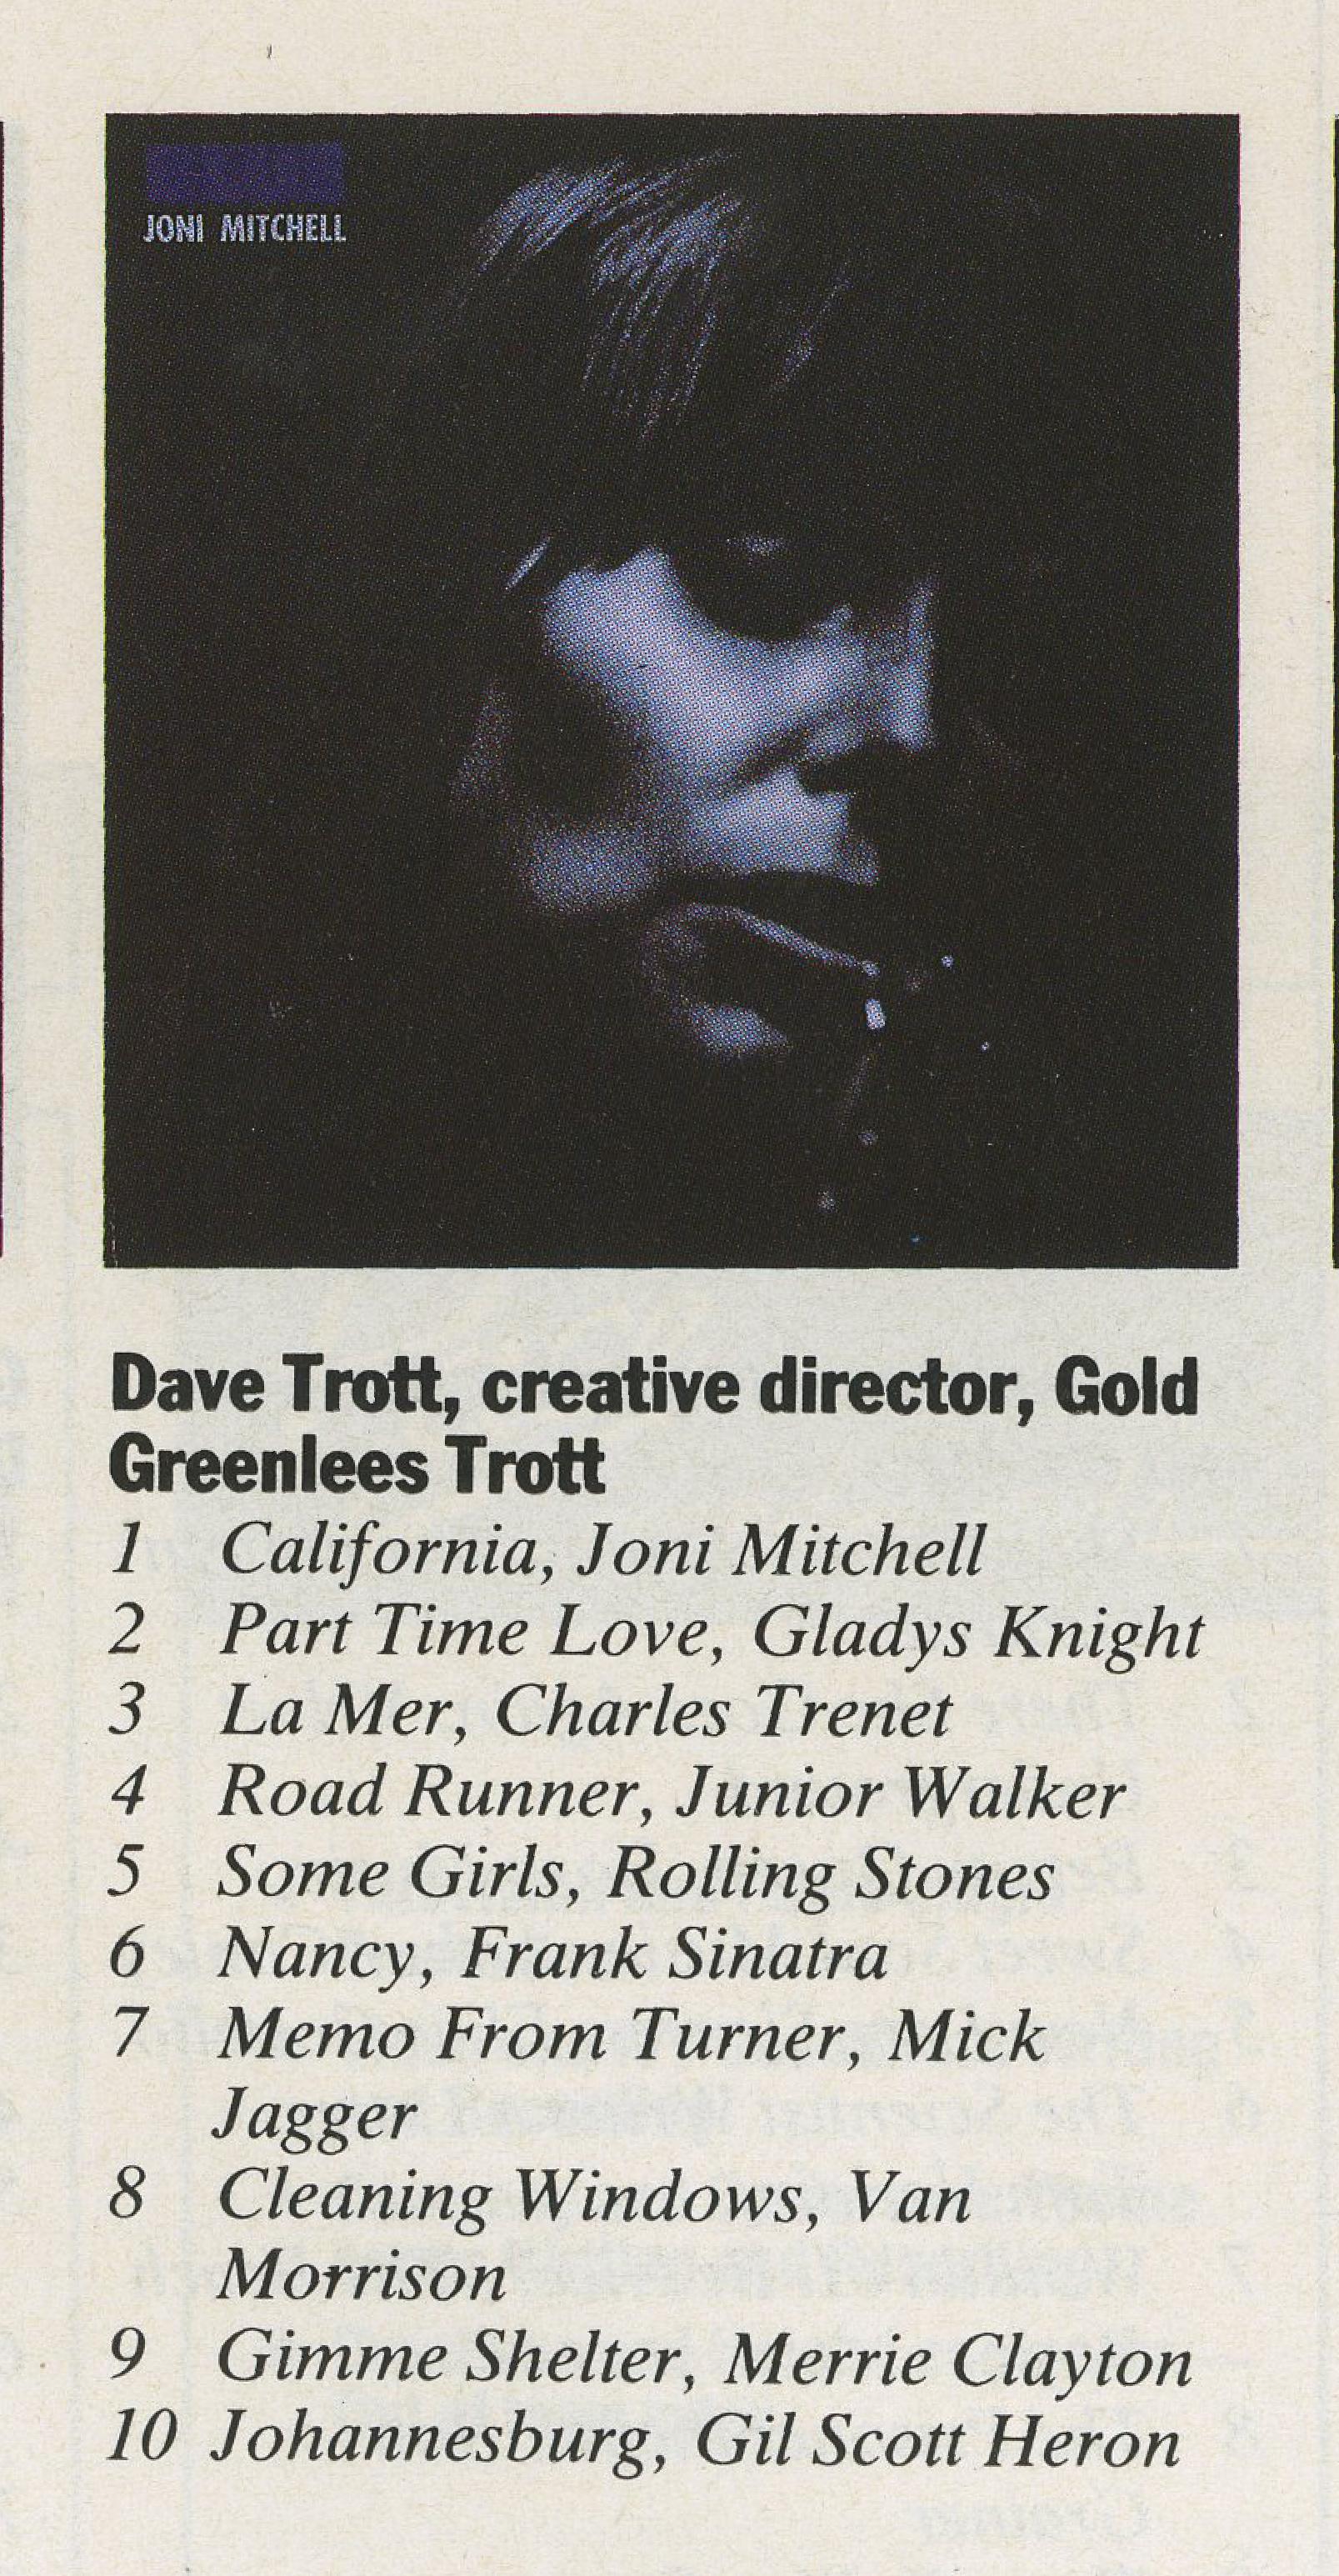 Dave Trott Top 10 Albums